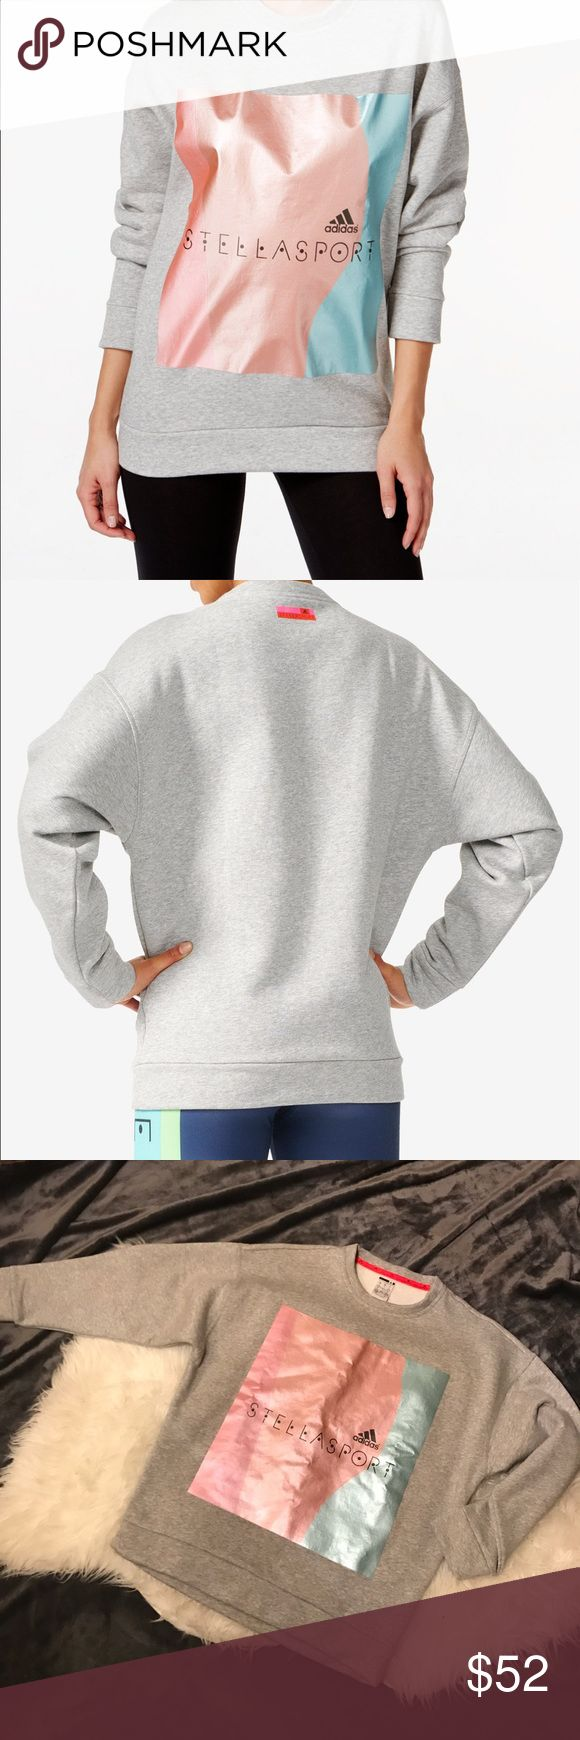 Adidas Stellasport sweatshirt  Stella MacCartney Great condition. Worn once. Size S Adidas by Stella McCartney Tops Sweatshirts & Hoodies